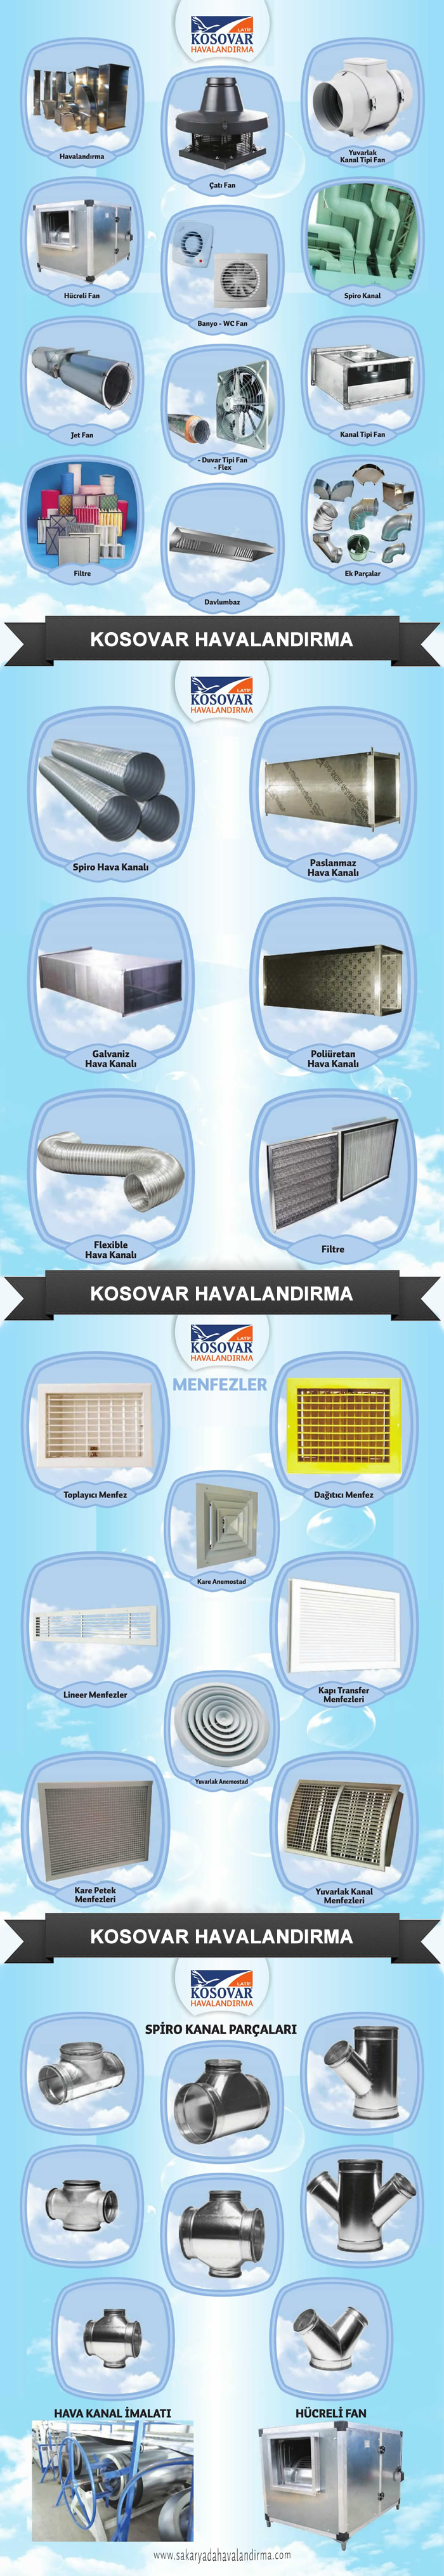 Kosovar Havalandırma